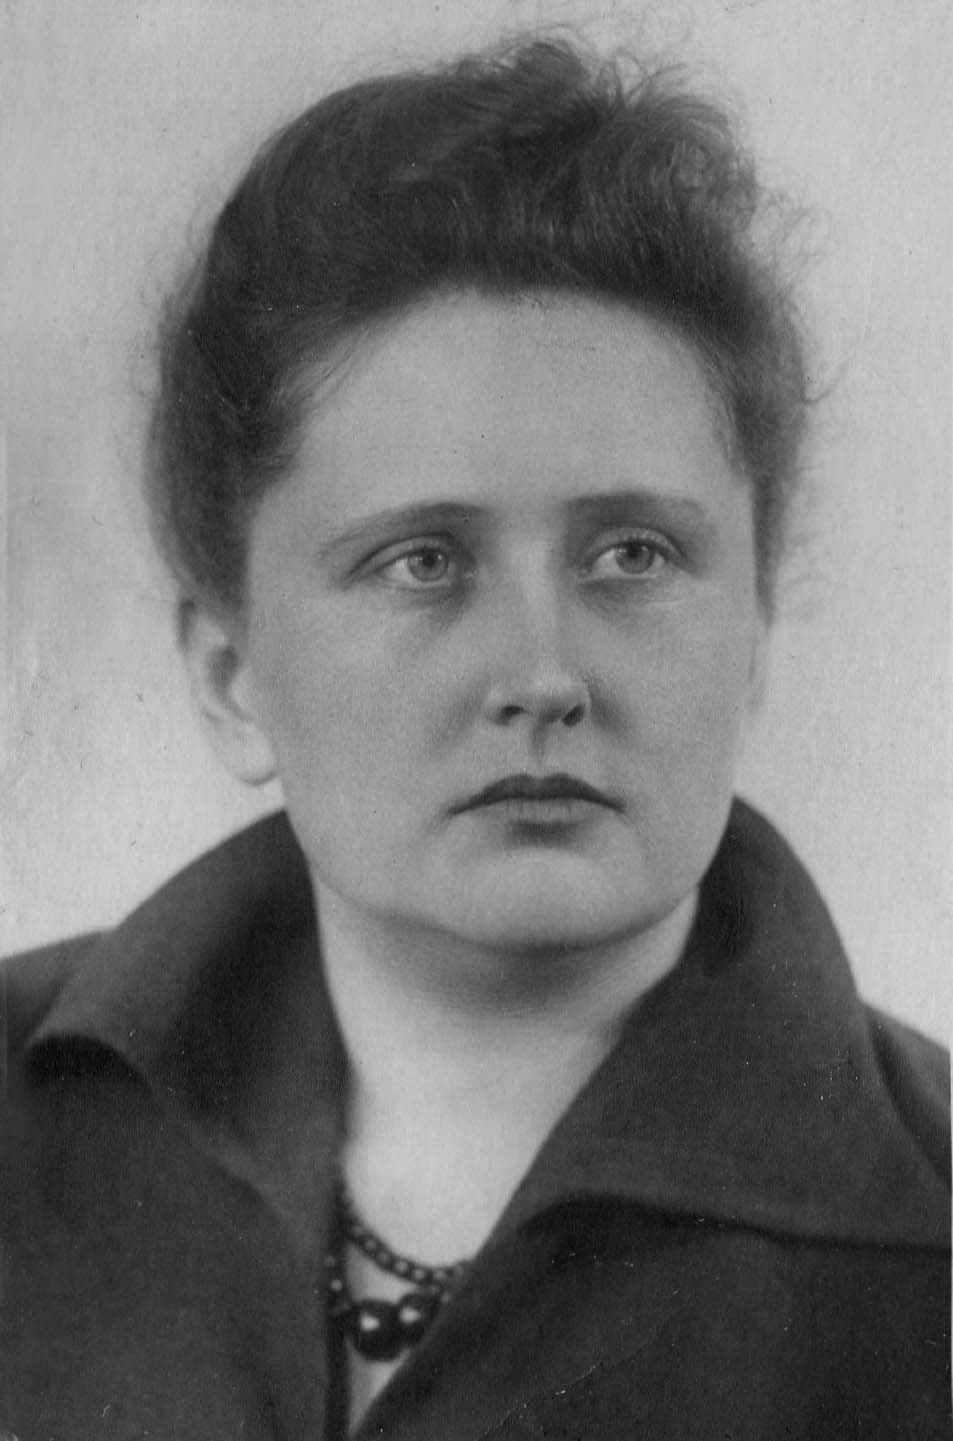 Экспонат #19. Попова Мая Николаевна. Март 1953 года